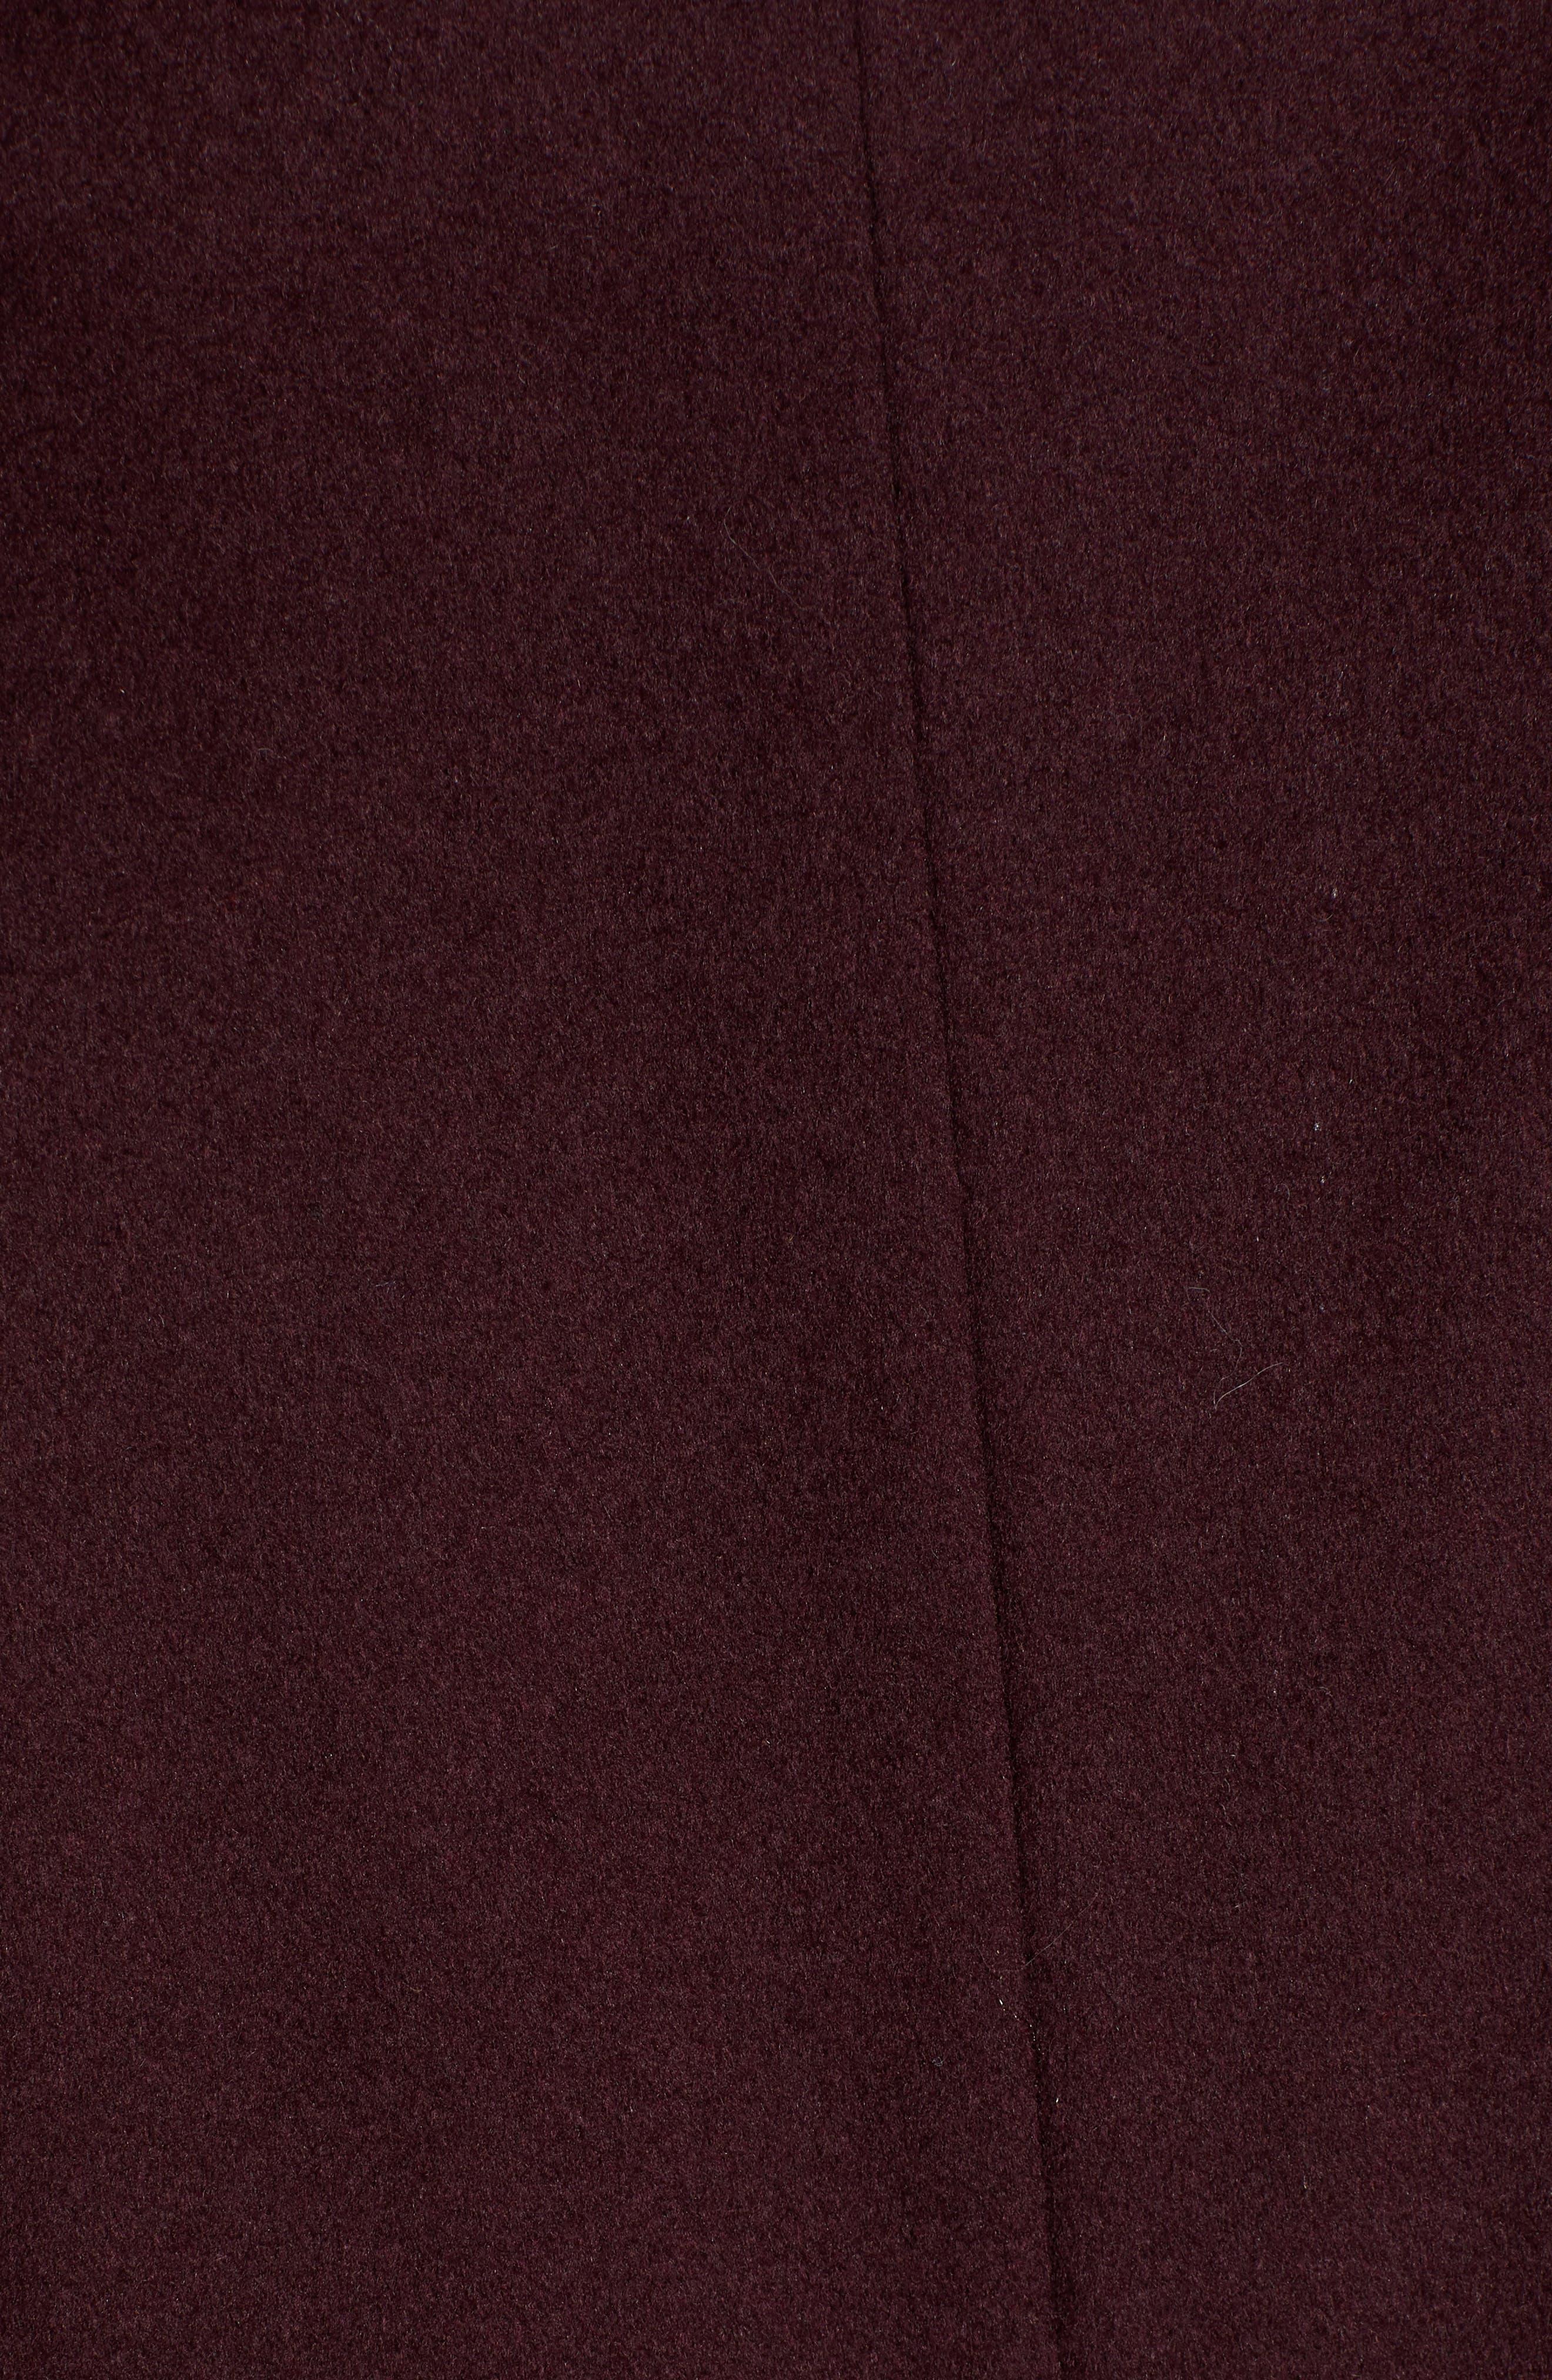 Sara Ruffle Cuff Wool Blend Coat,                             Alternate thumbnail 7, color,                             WINE